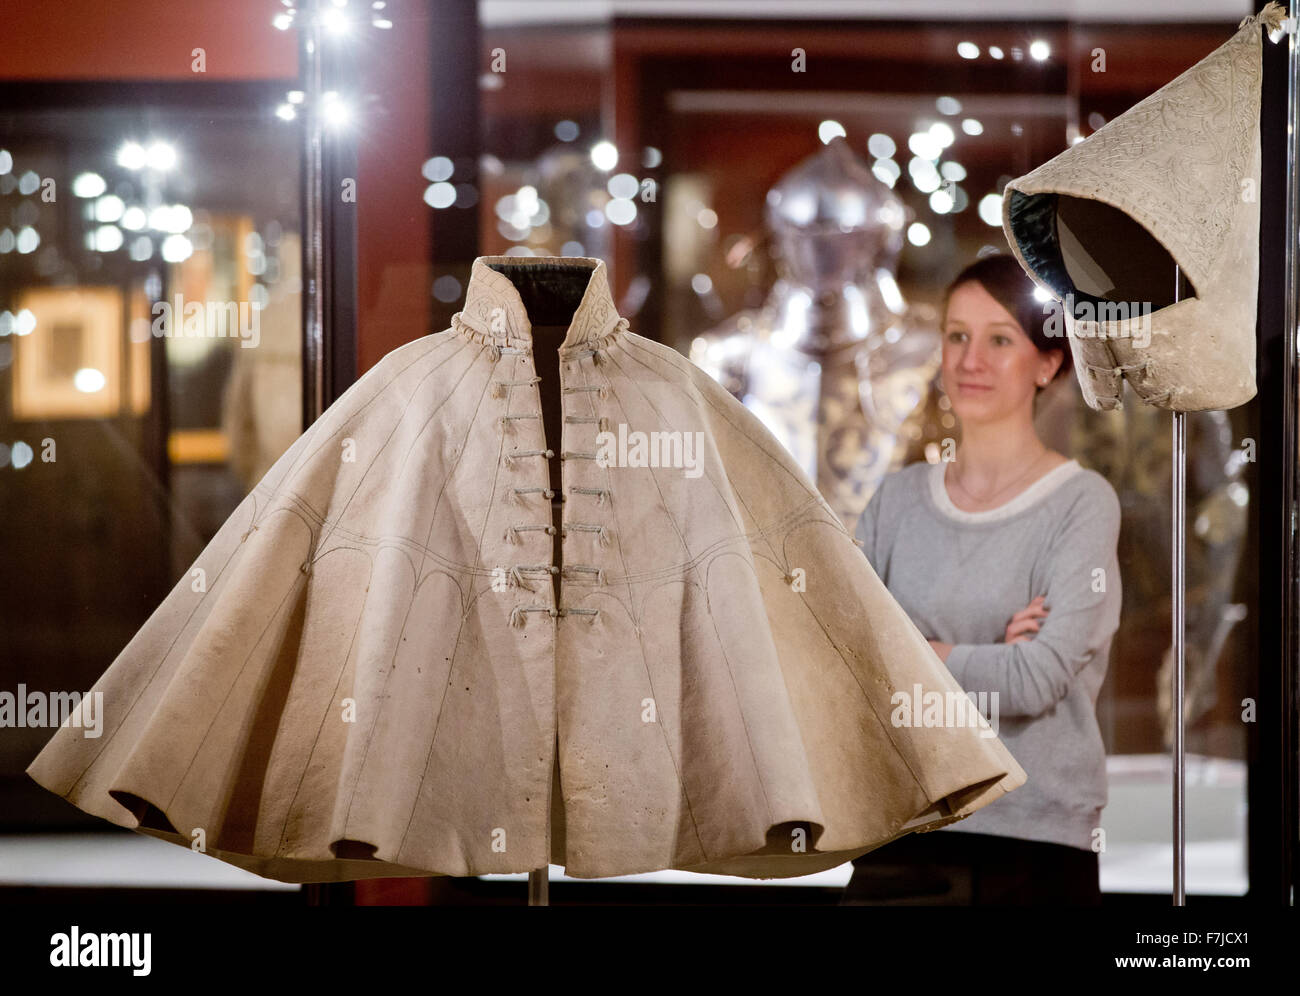 nuremberg, germany. 01st dec, 2015. a coat featuring a hood